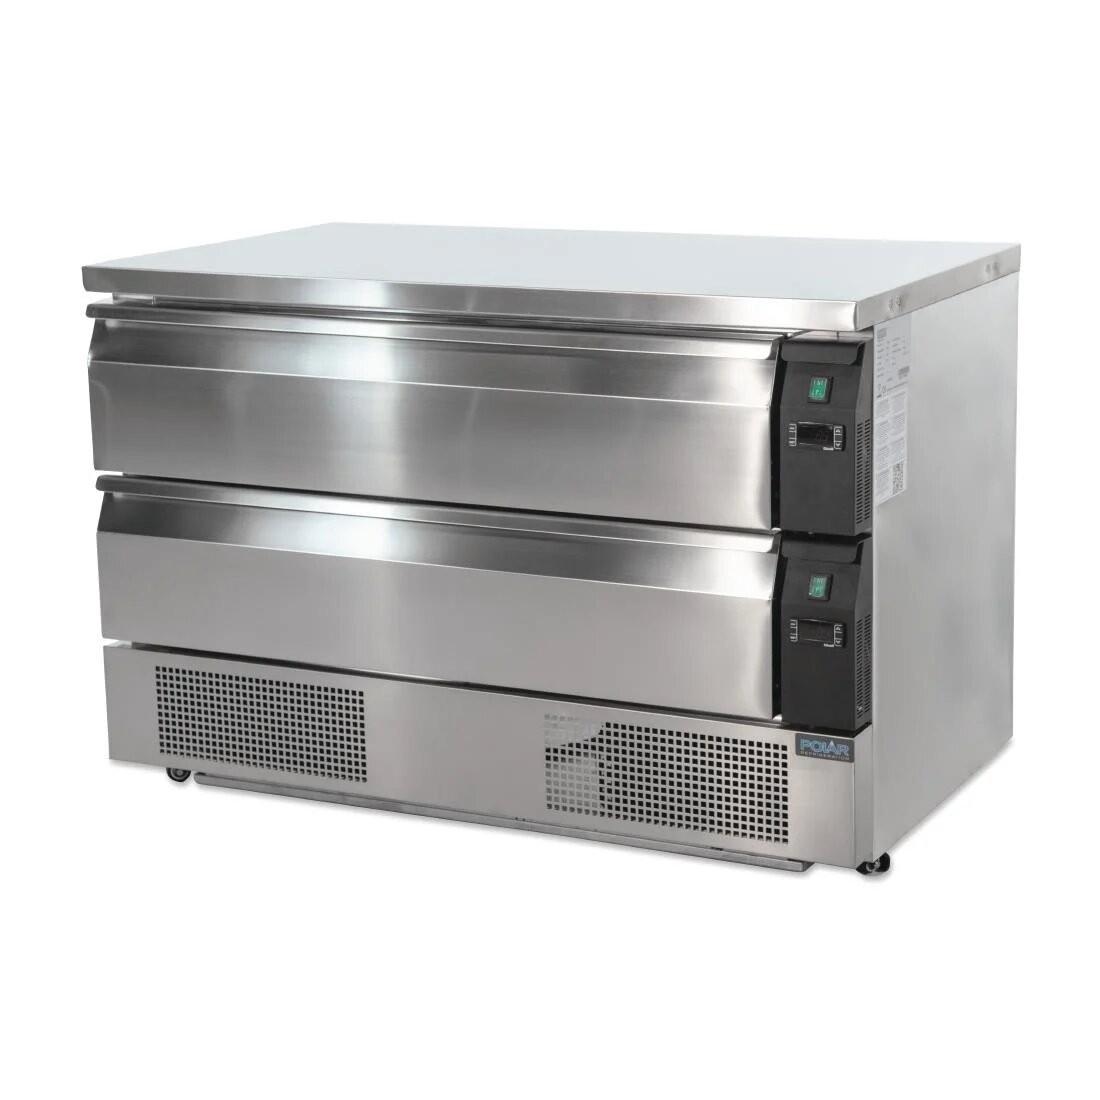 Polar DA997 U-Series Double Drawer Counter Fridge Freezer